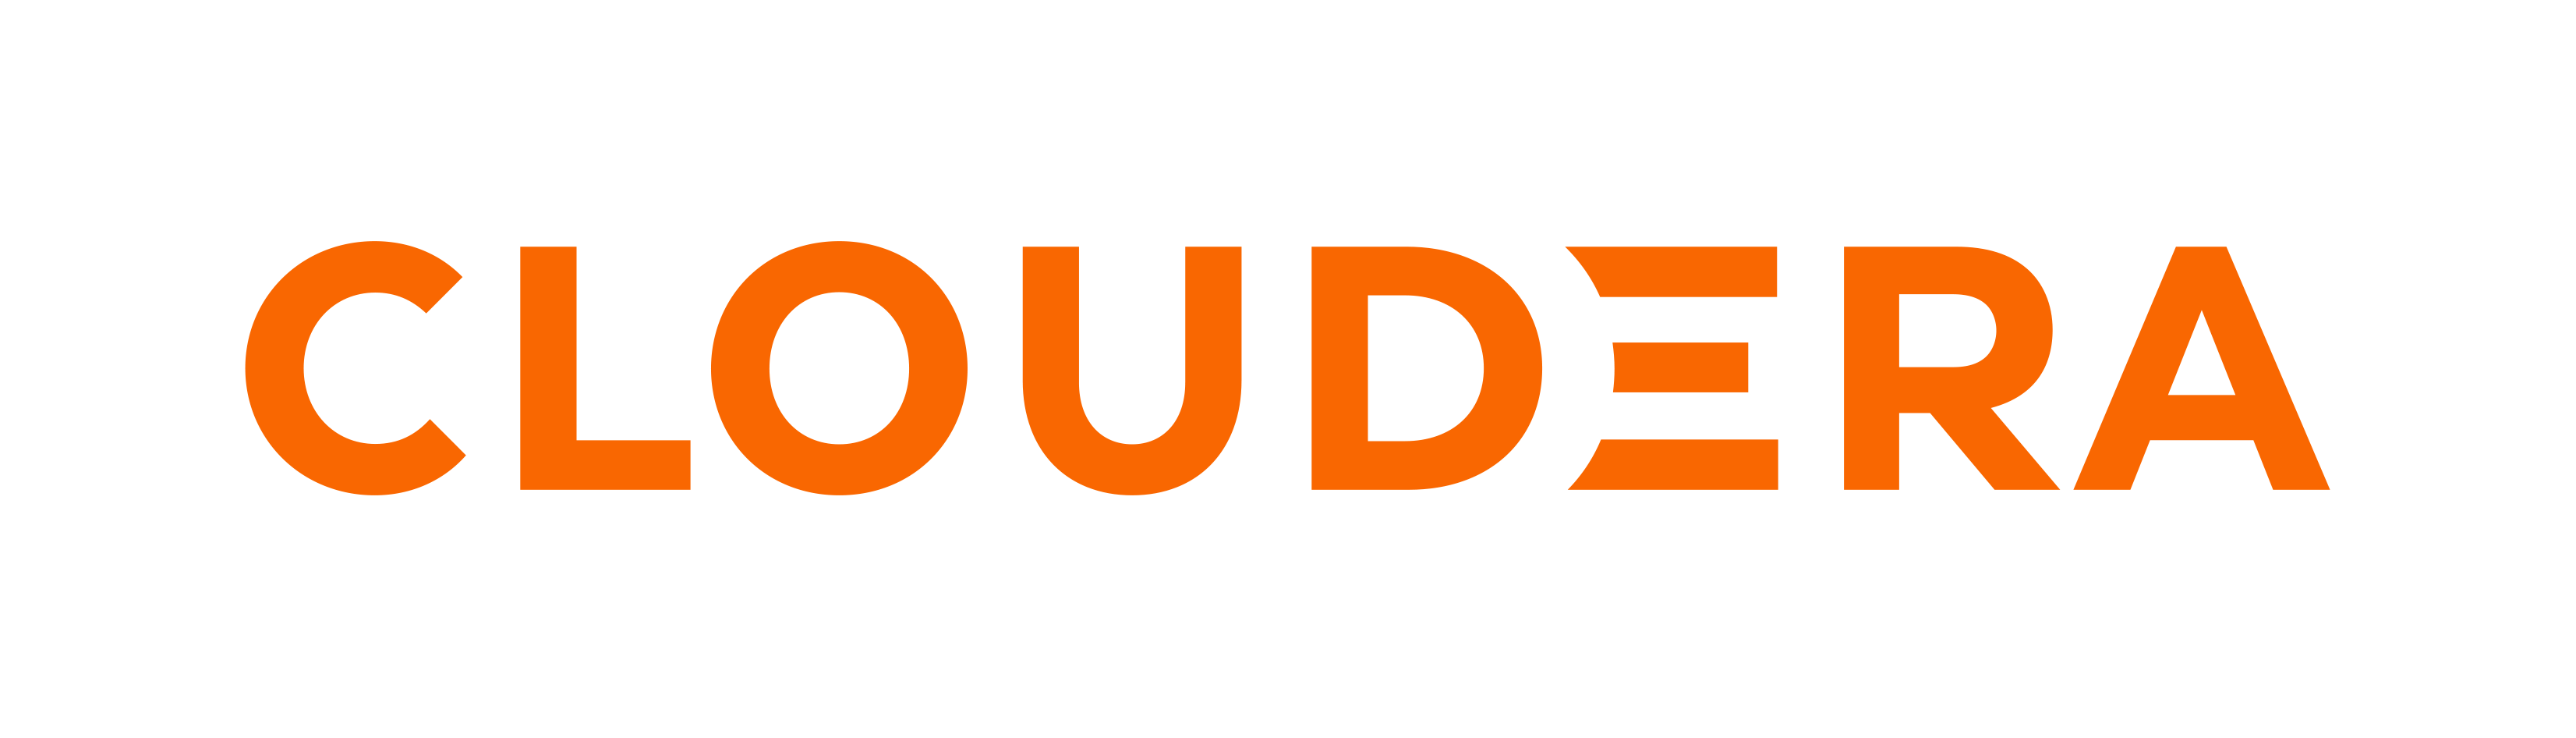 Logo for Cloudera